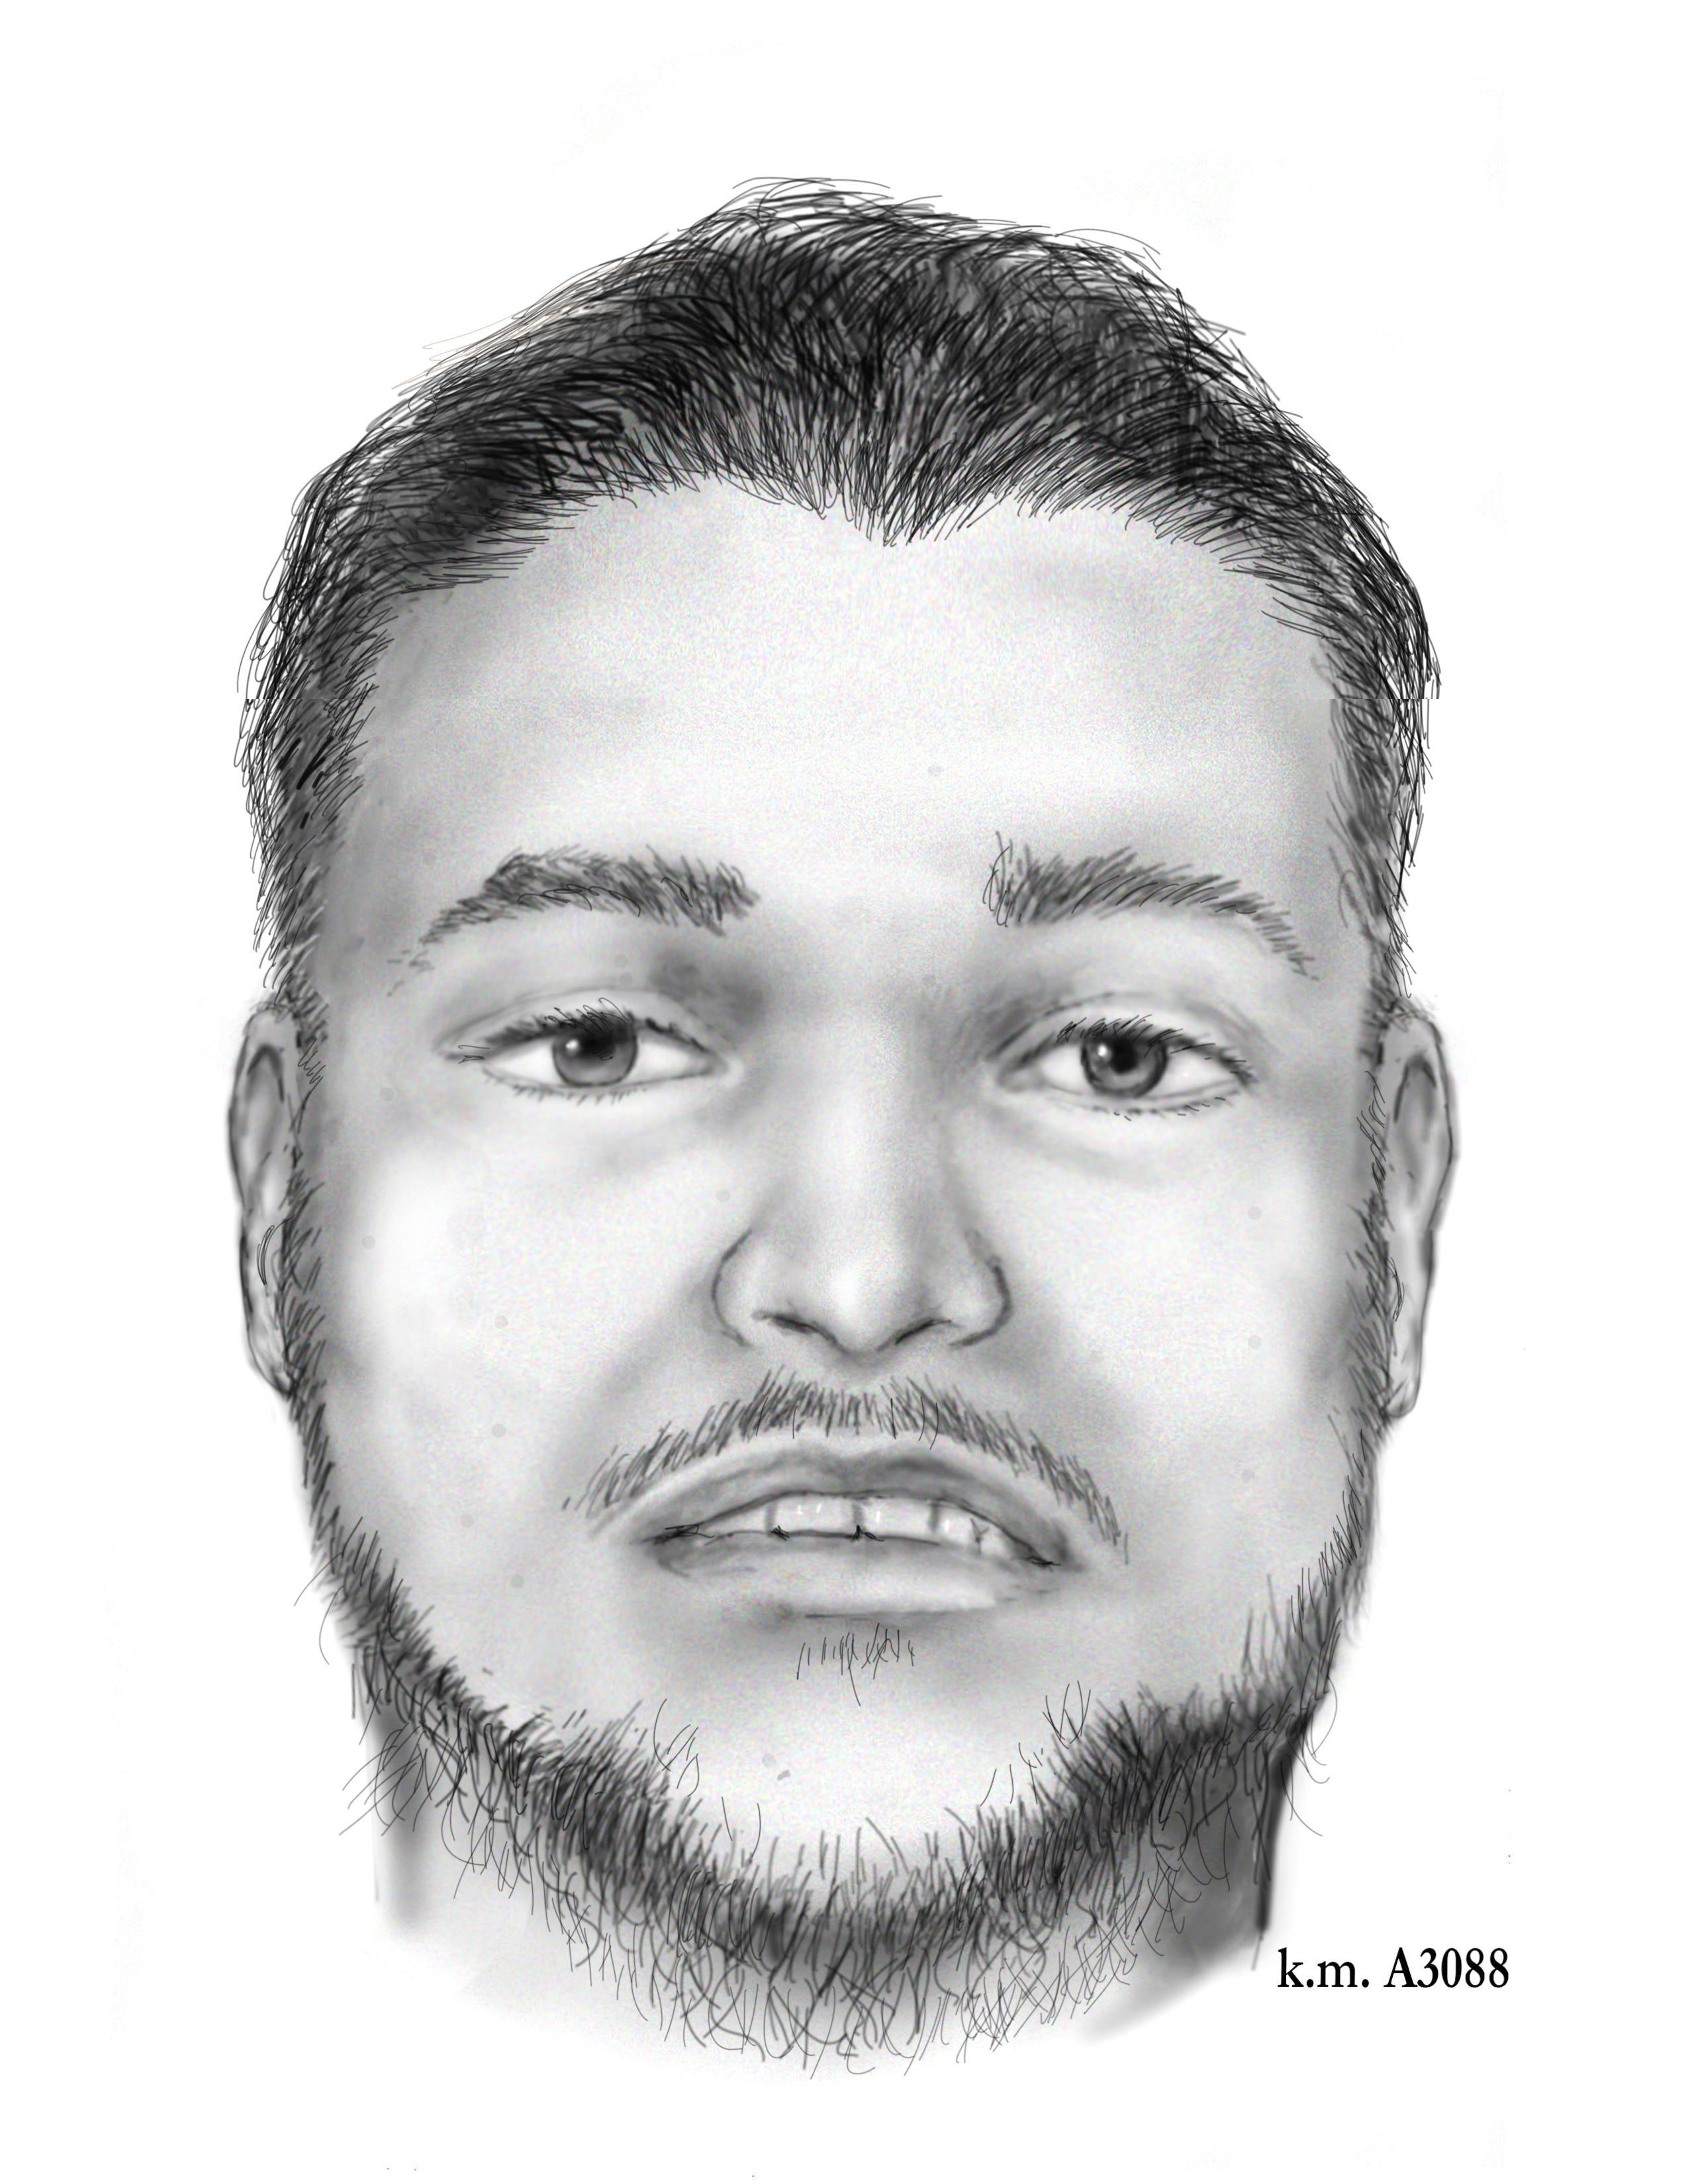 Phoenix PD identify man found fatally shot on South Mountain